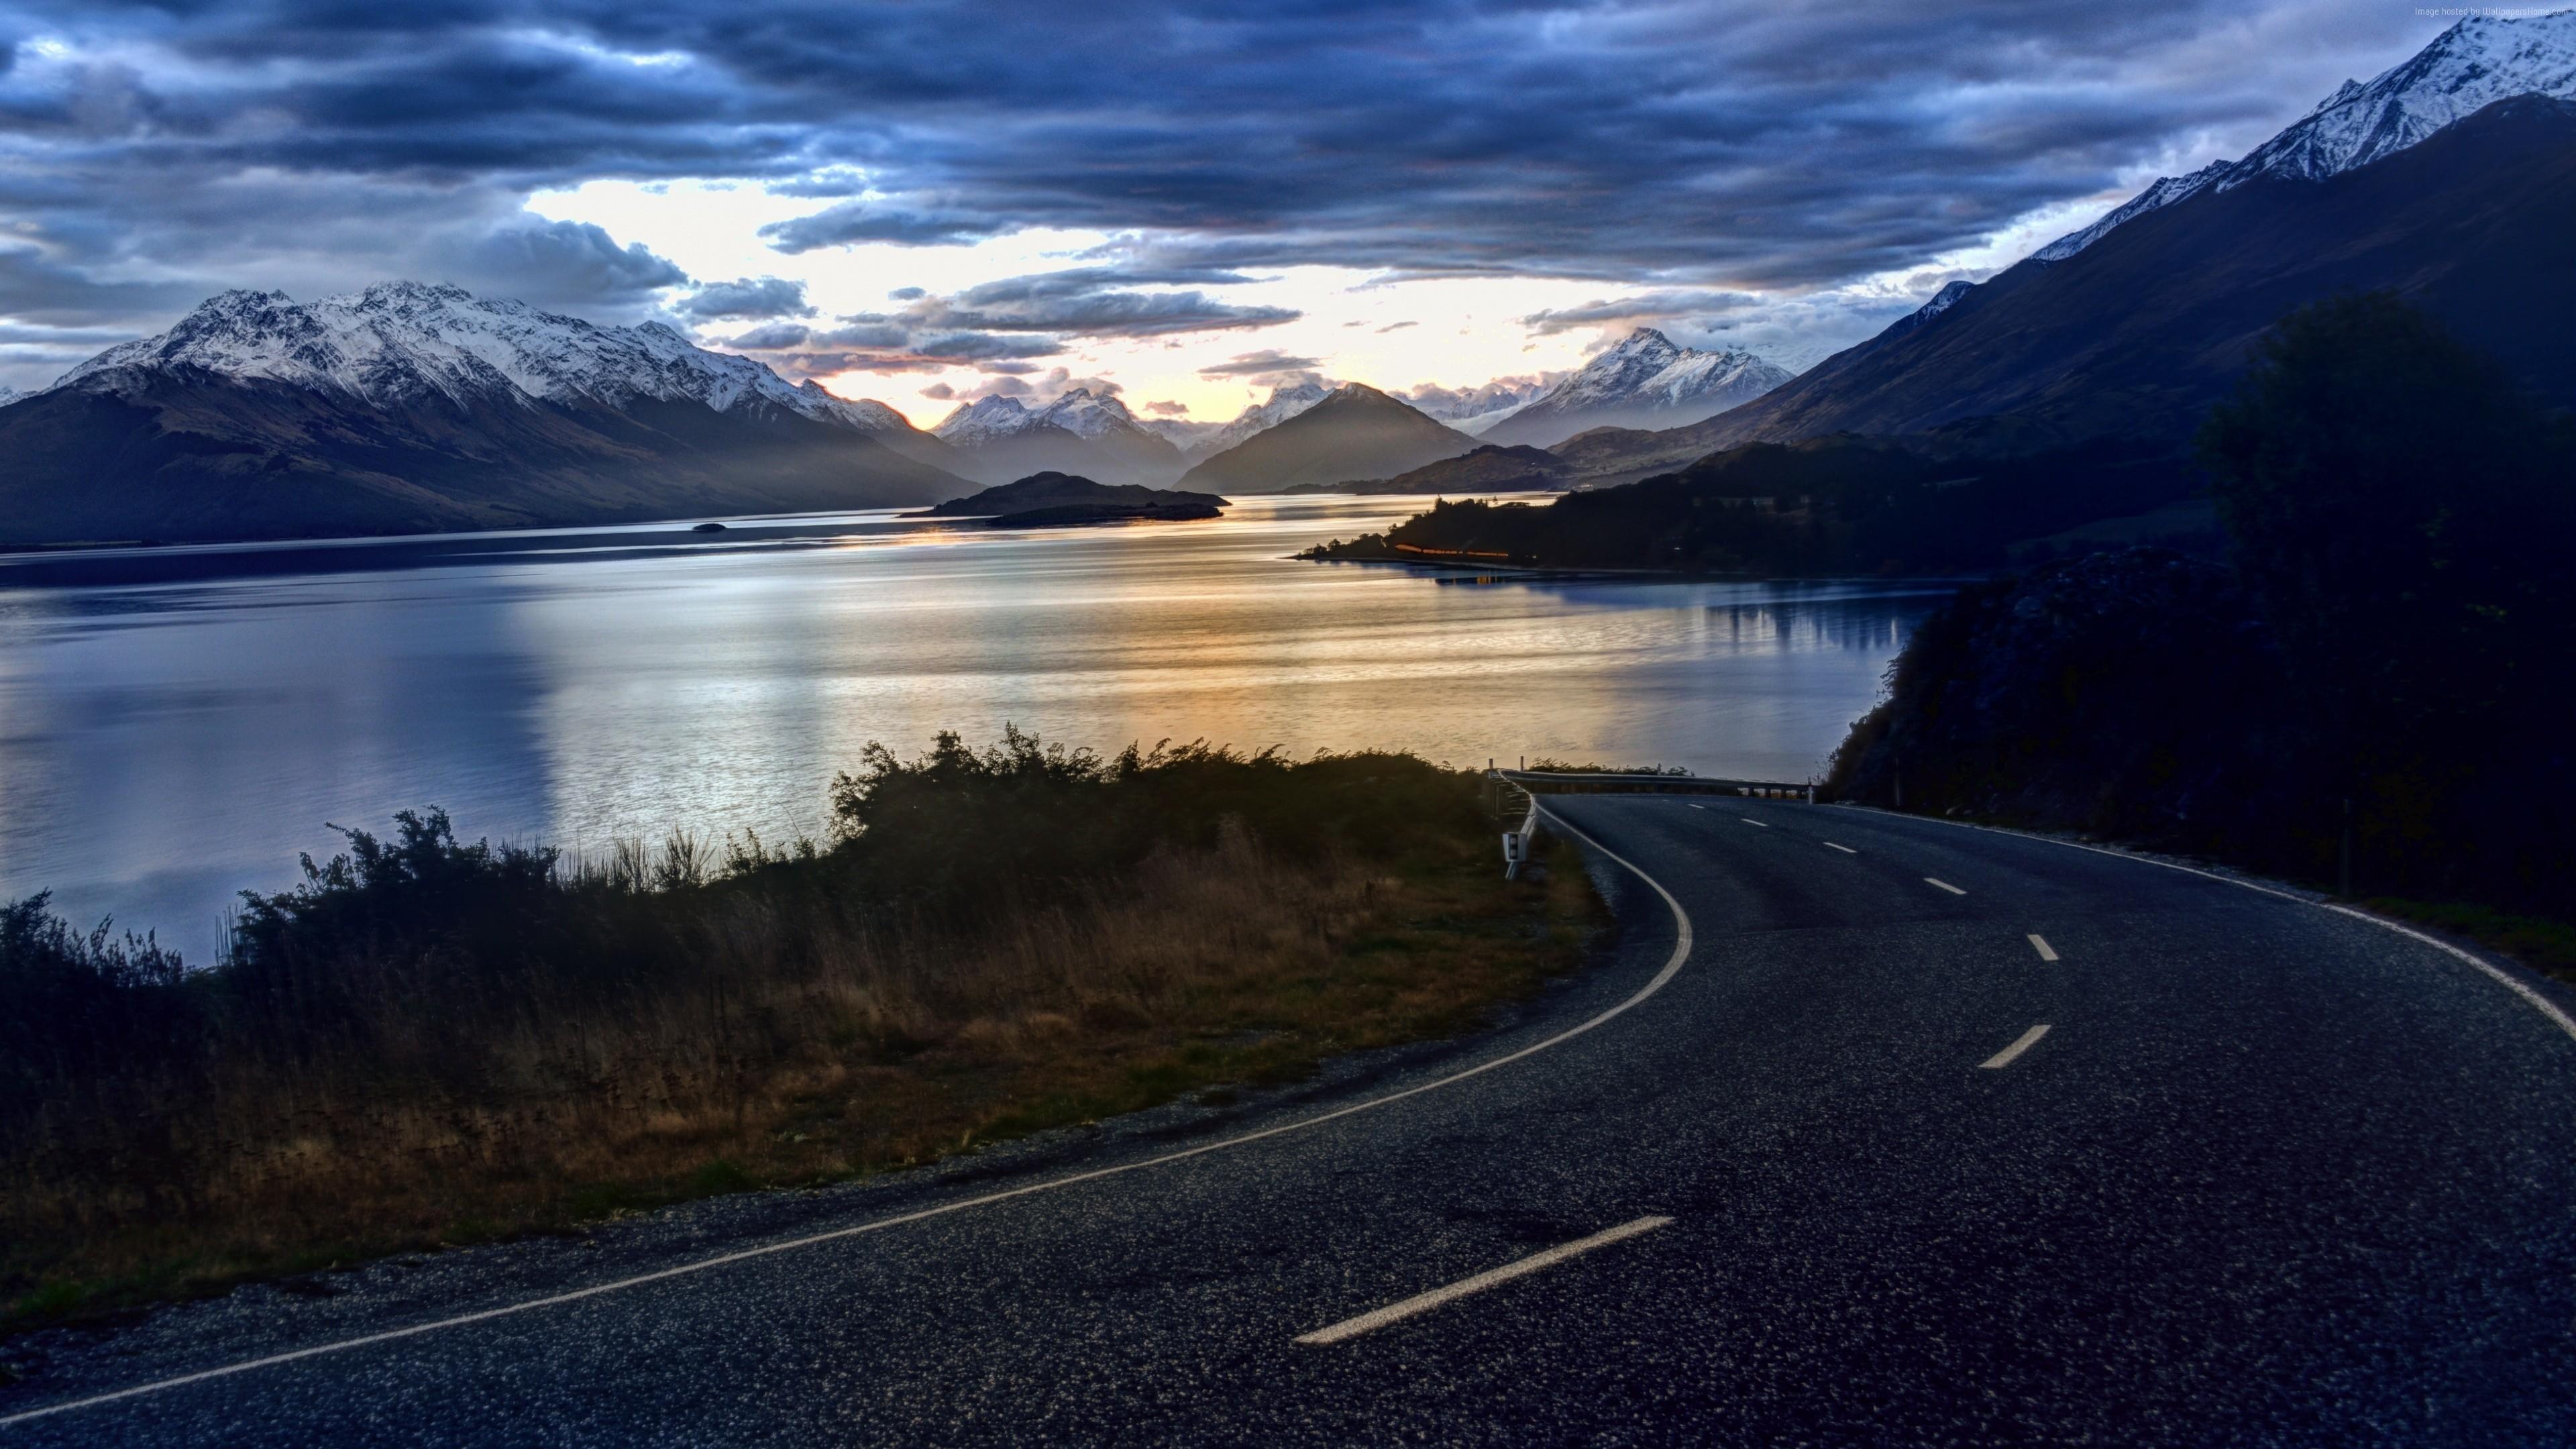 New Zealand, 4k, HD wallpaper, nature, sky, clouds, lake, …